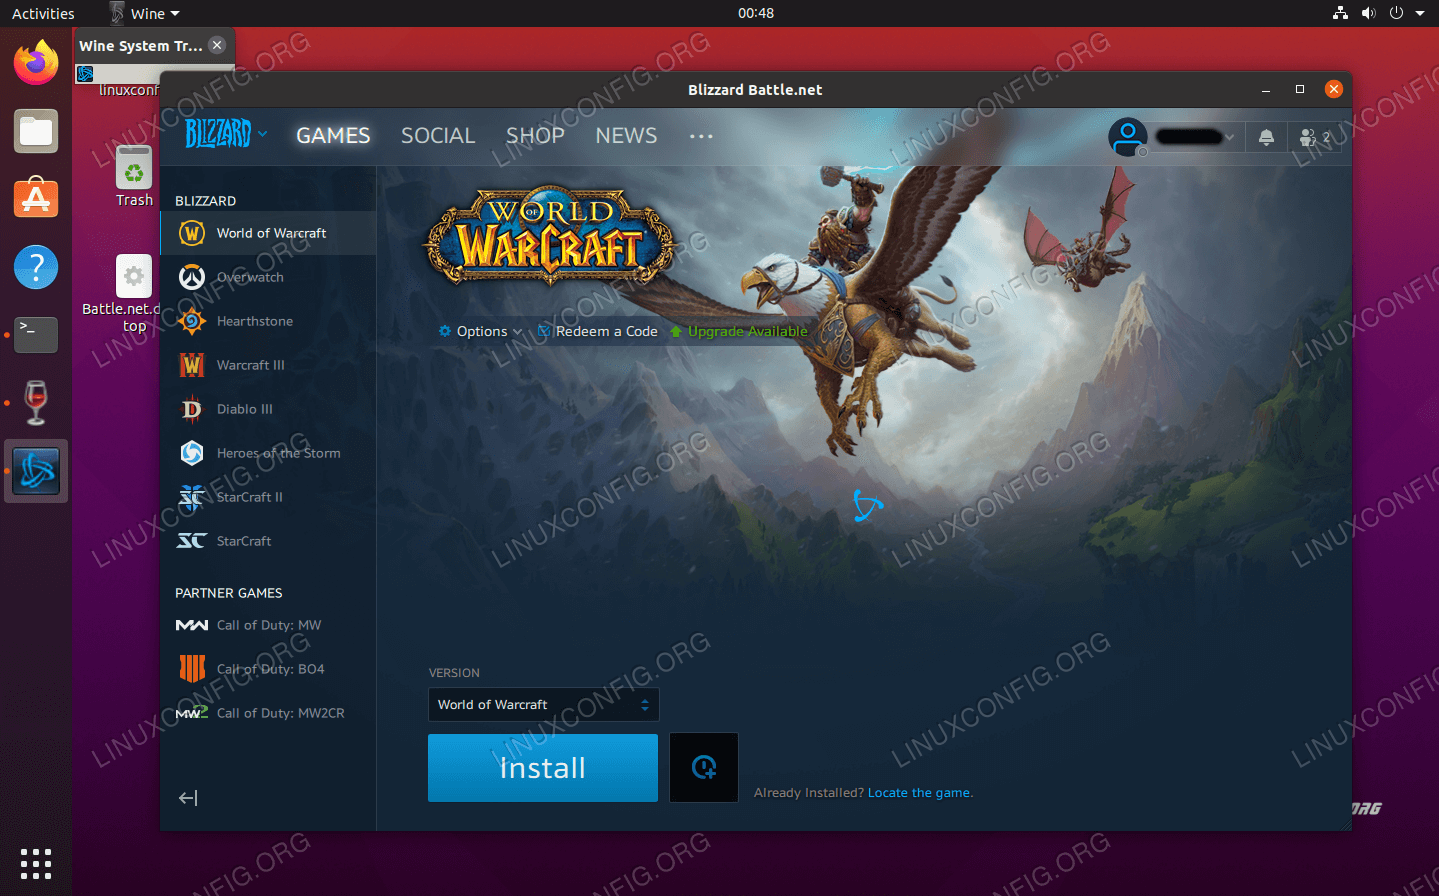 Running Battle.net on Ubuntu 20.04 Focal Fossa